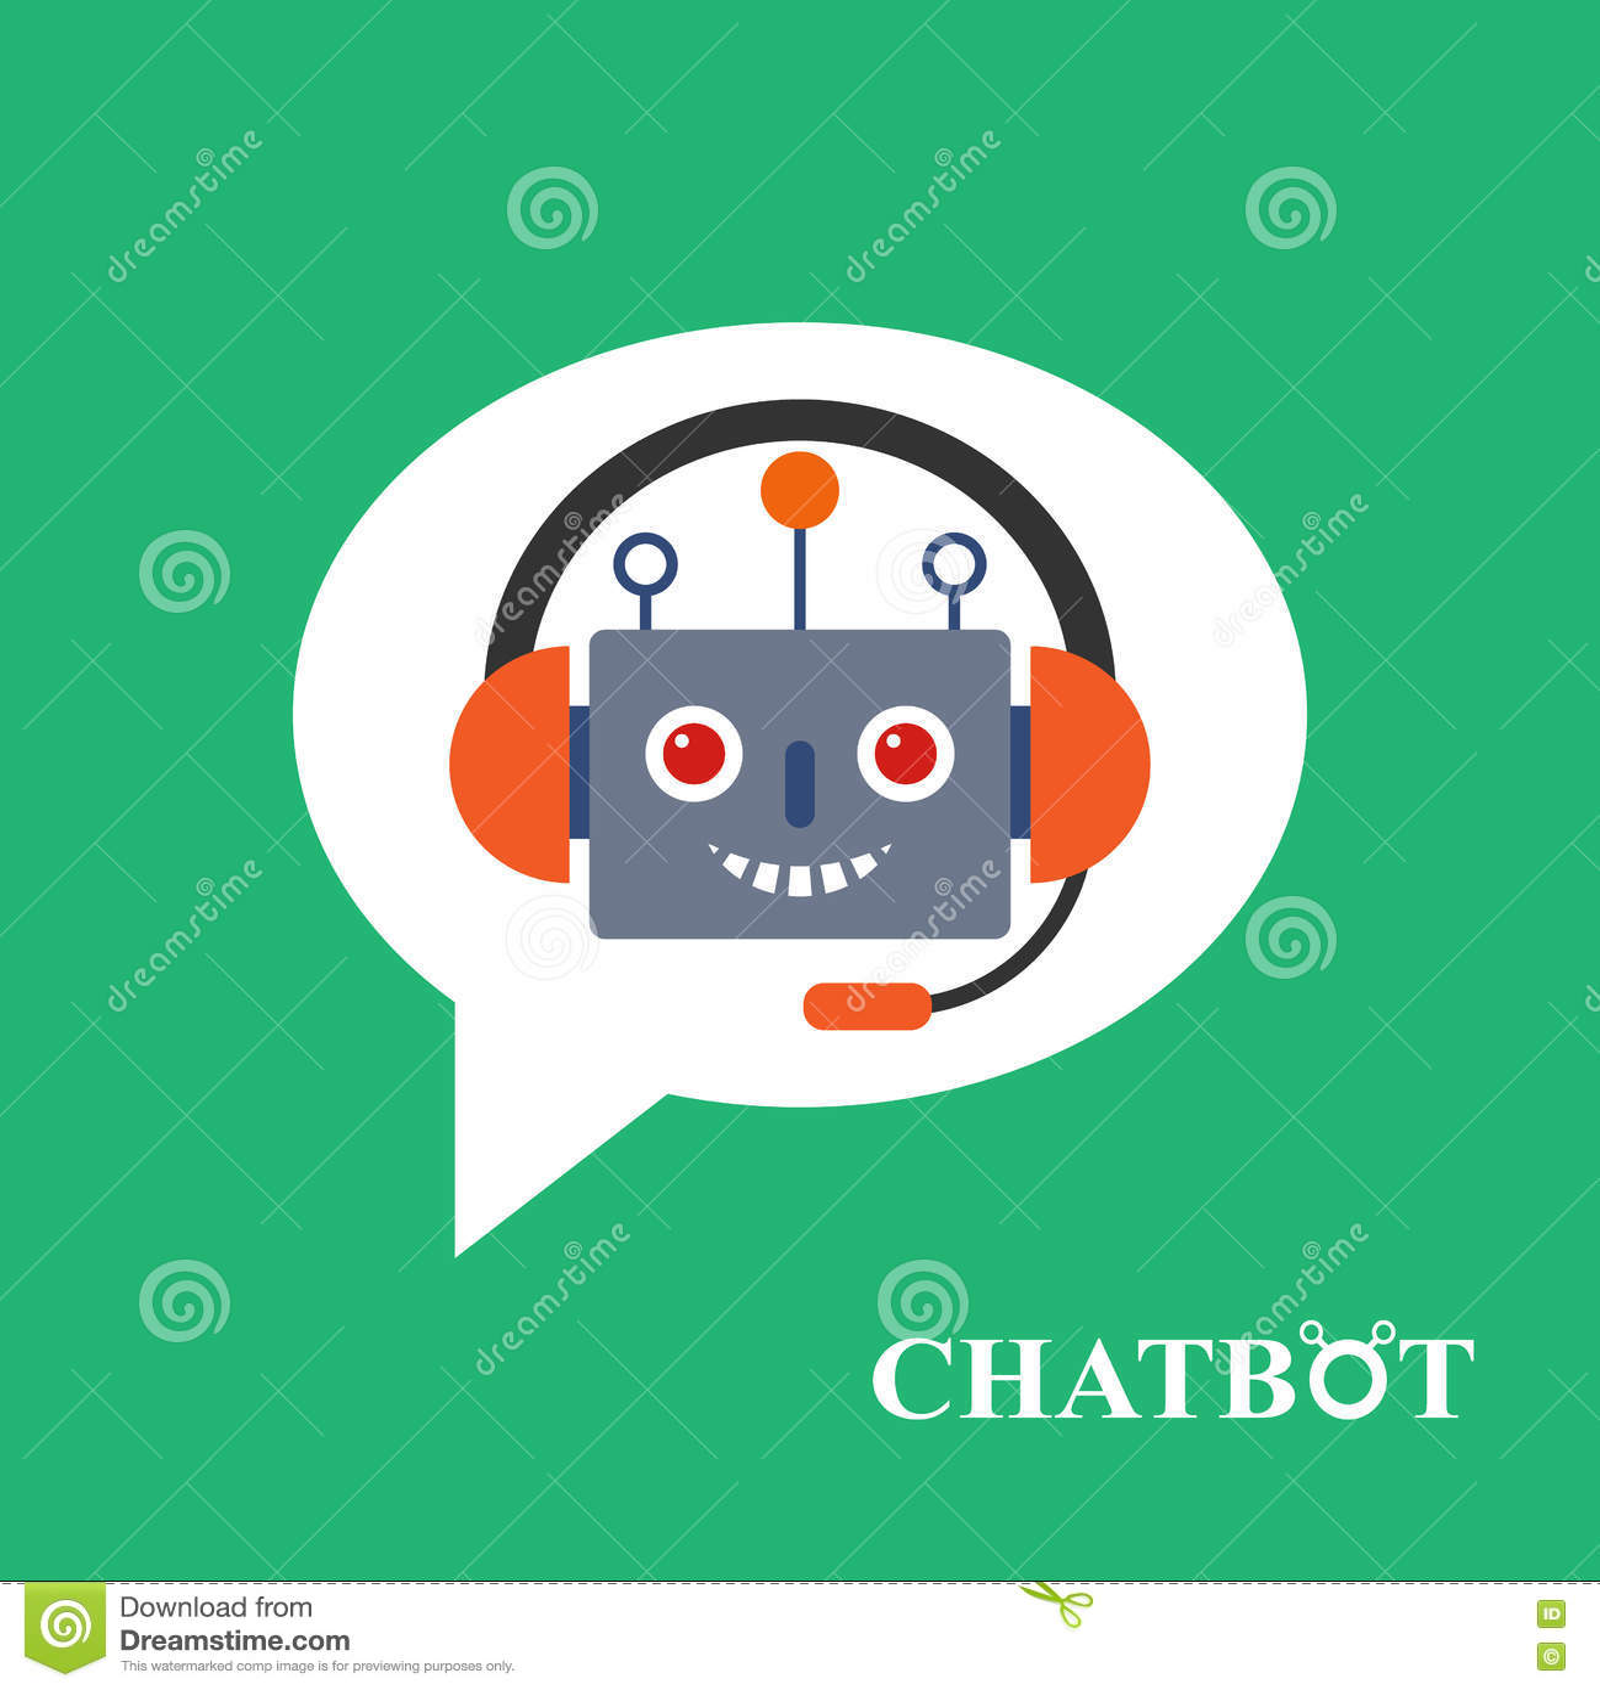 Chatbot icon concept